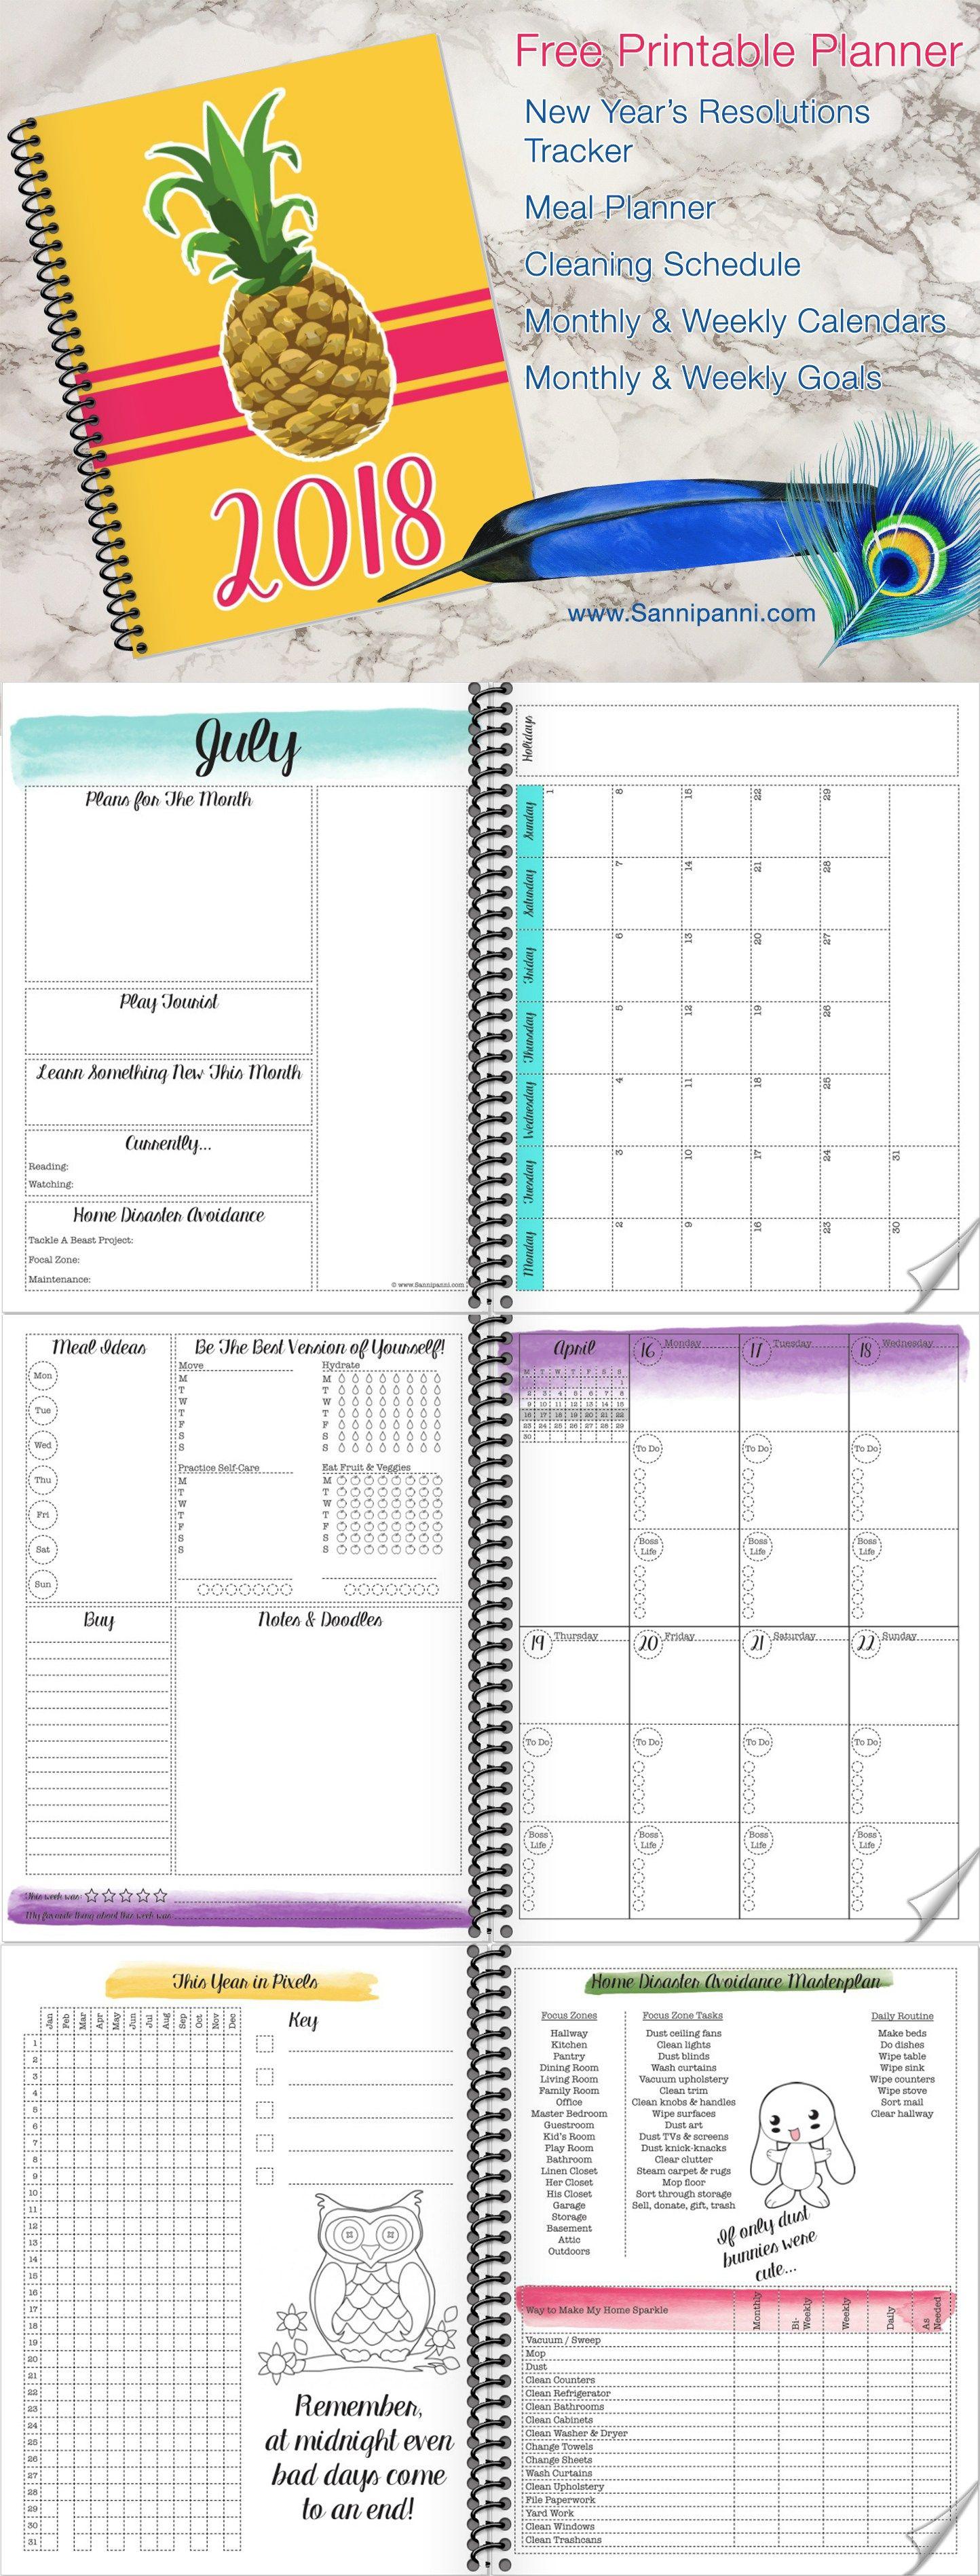 meal planning calendar free